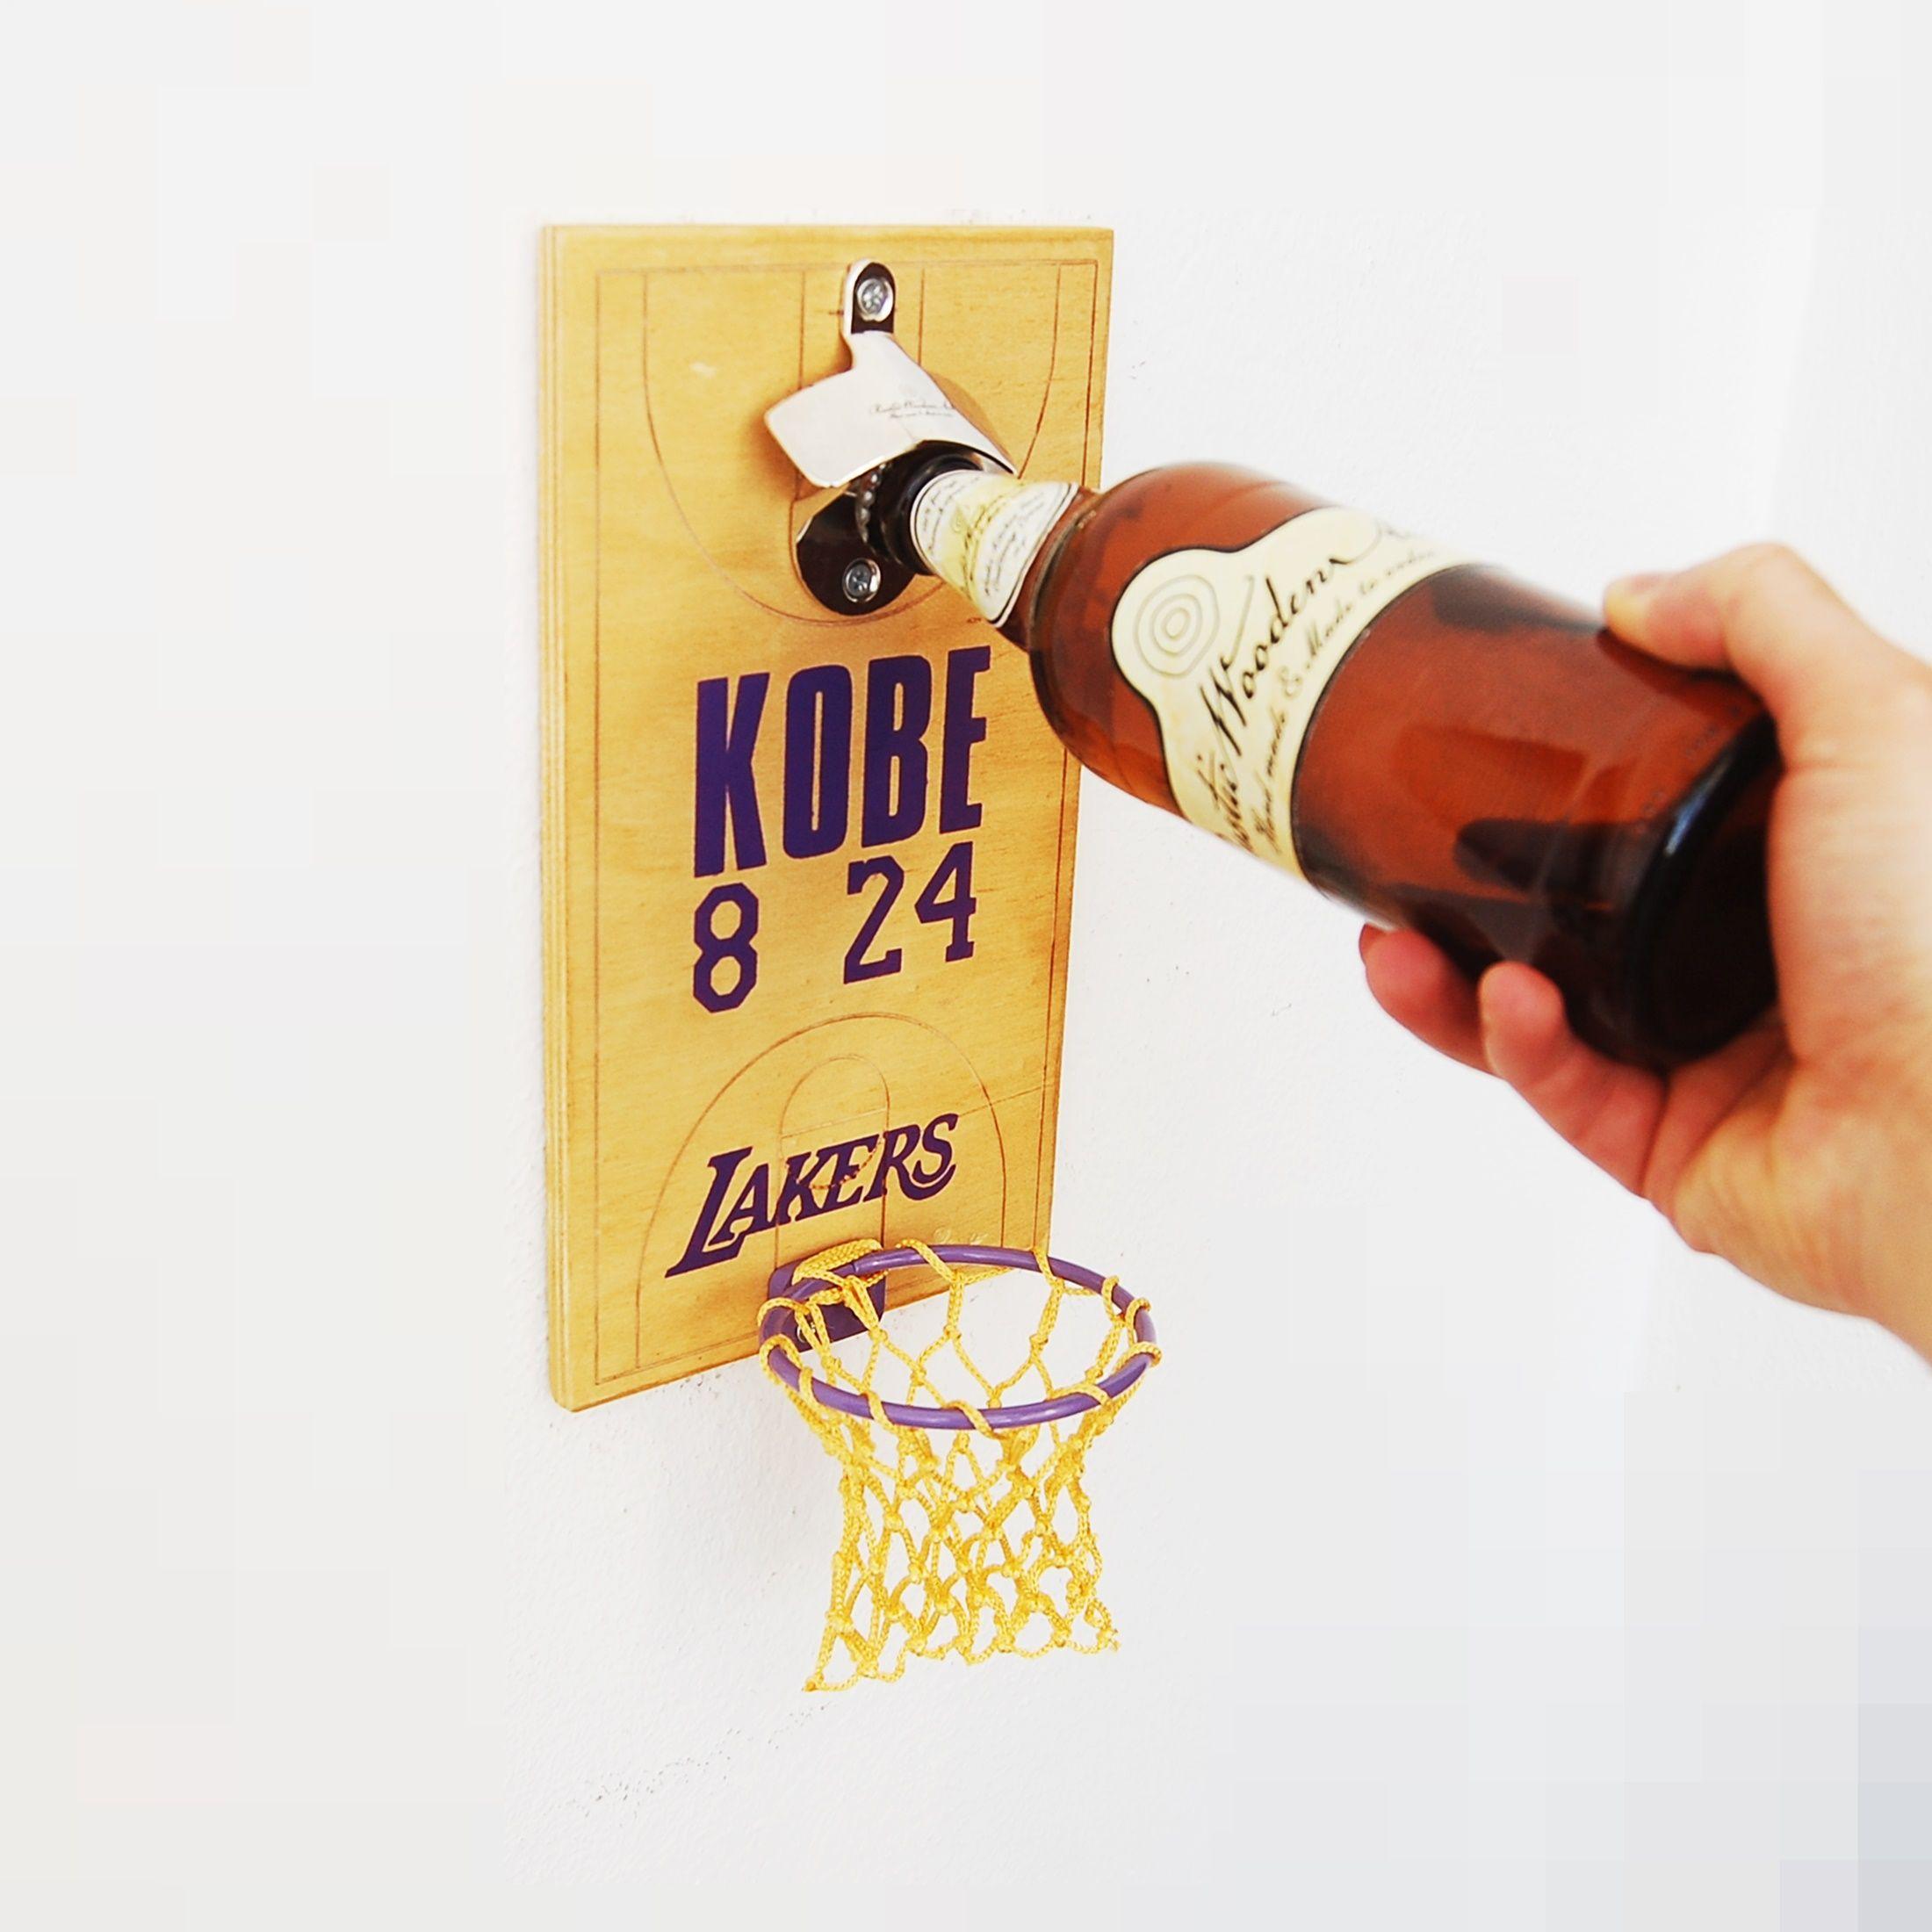 Kobe bryant kobe black mamba los angeles lakers lakers